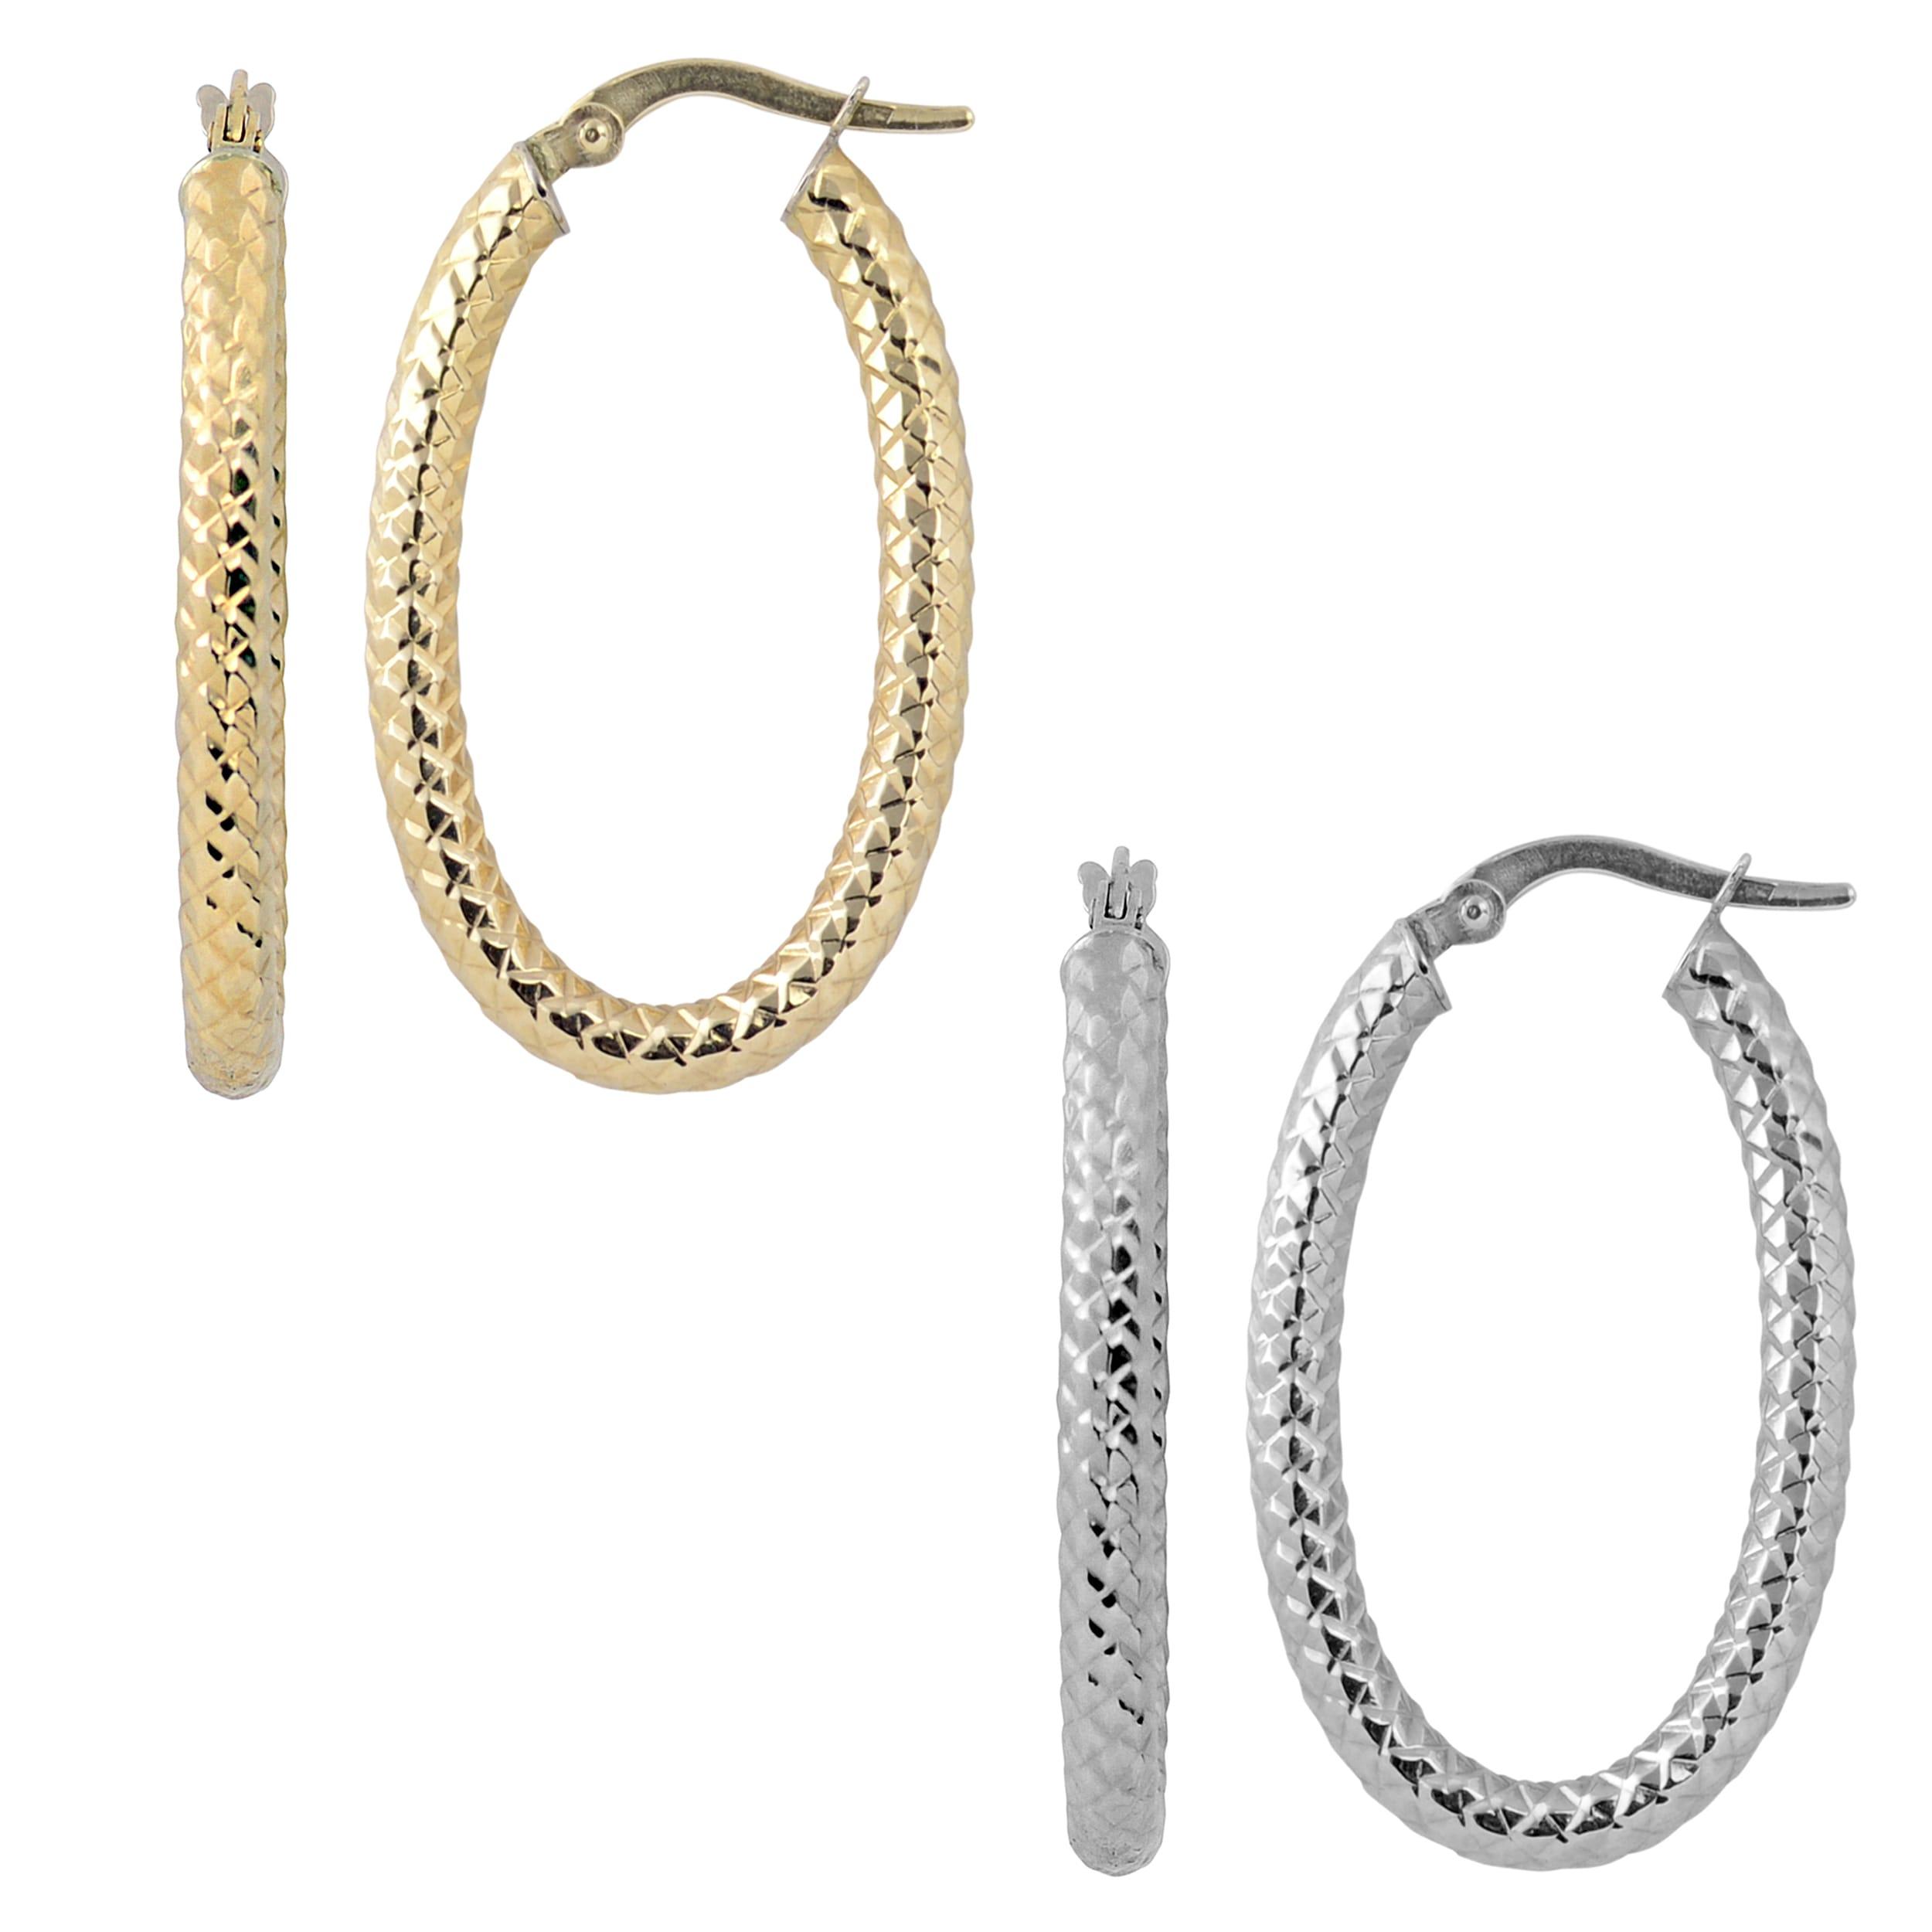 Fremada 10k Yellow or White Gold Diamond-cut Oval Hoop Earrings at Sears.com